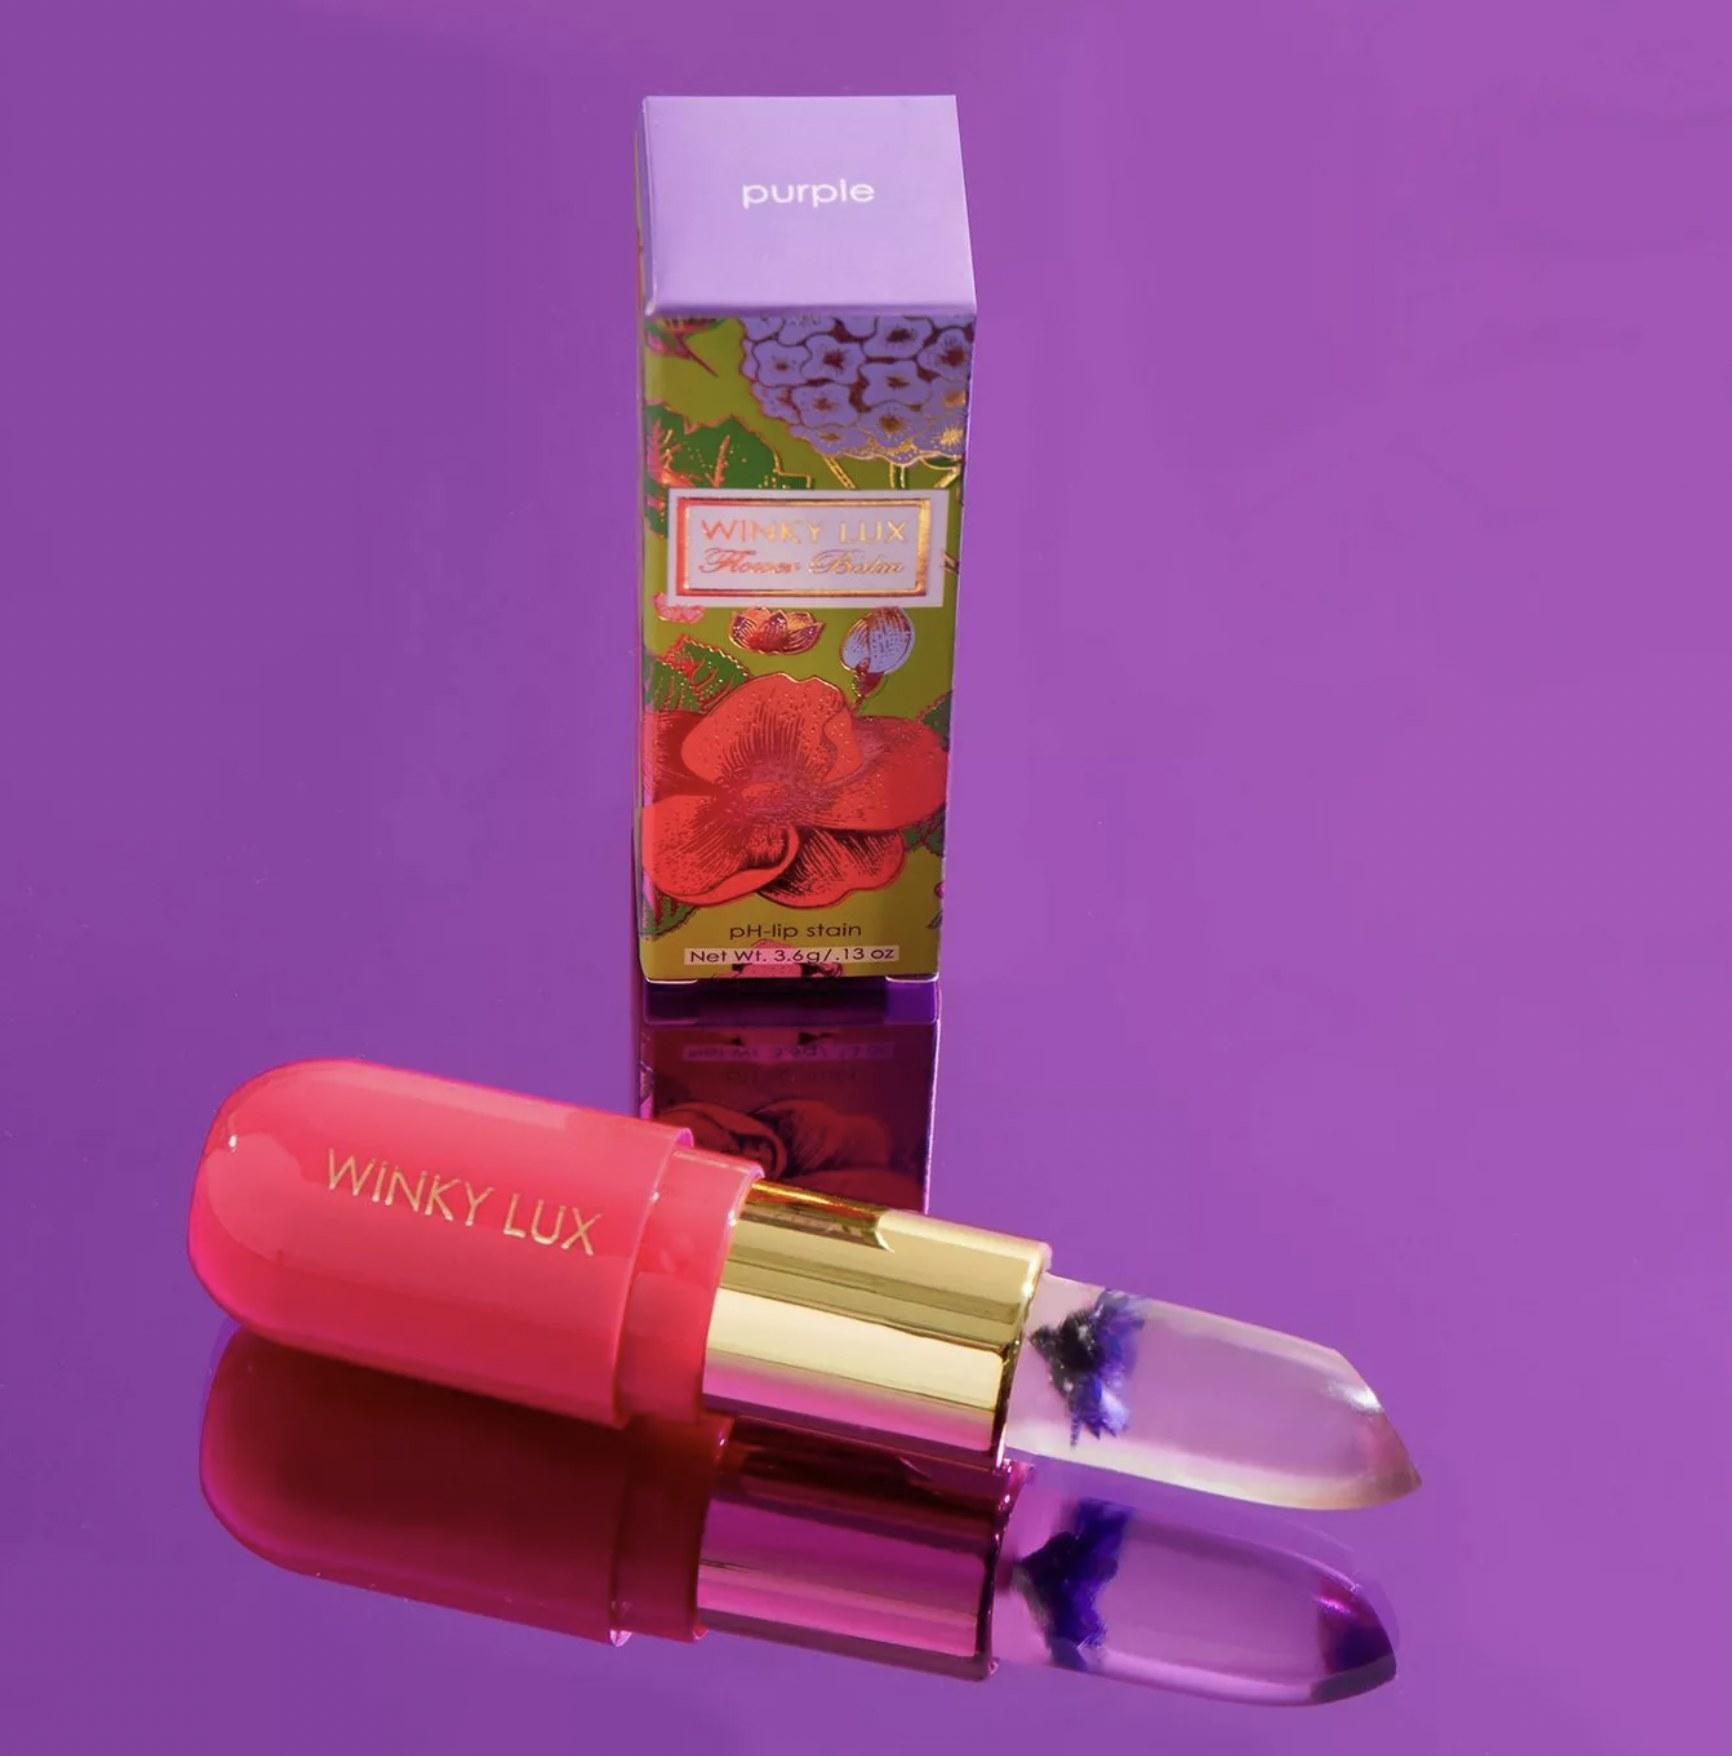 Winky Lux Flower Balm Lip against purple background